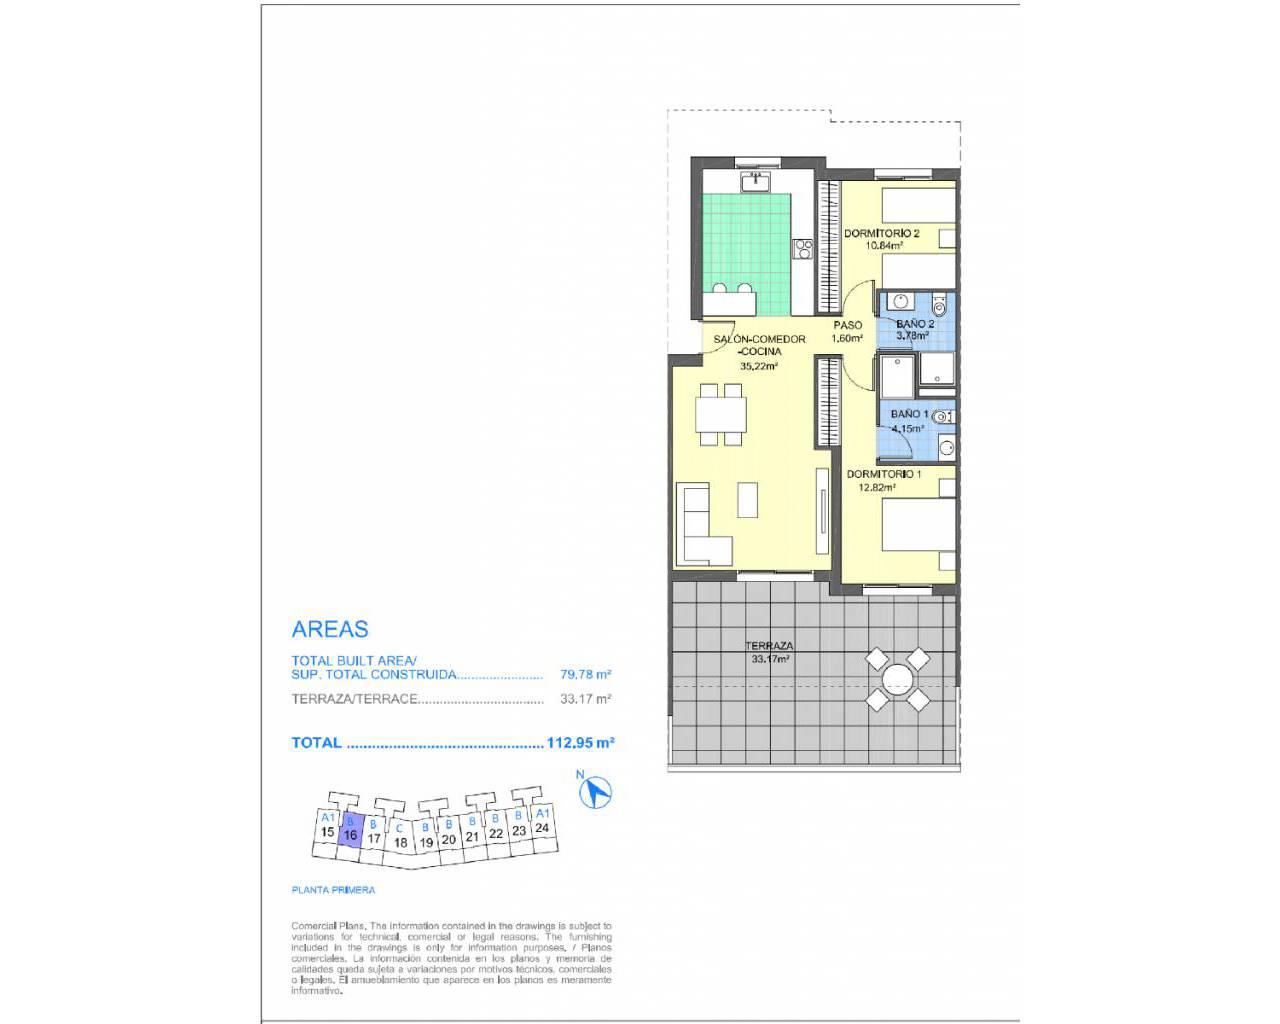 nieuwbouw-appartement-orihuela-costa-las-filipinas_5834_xl